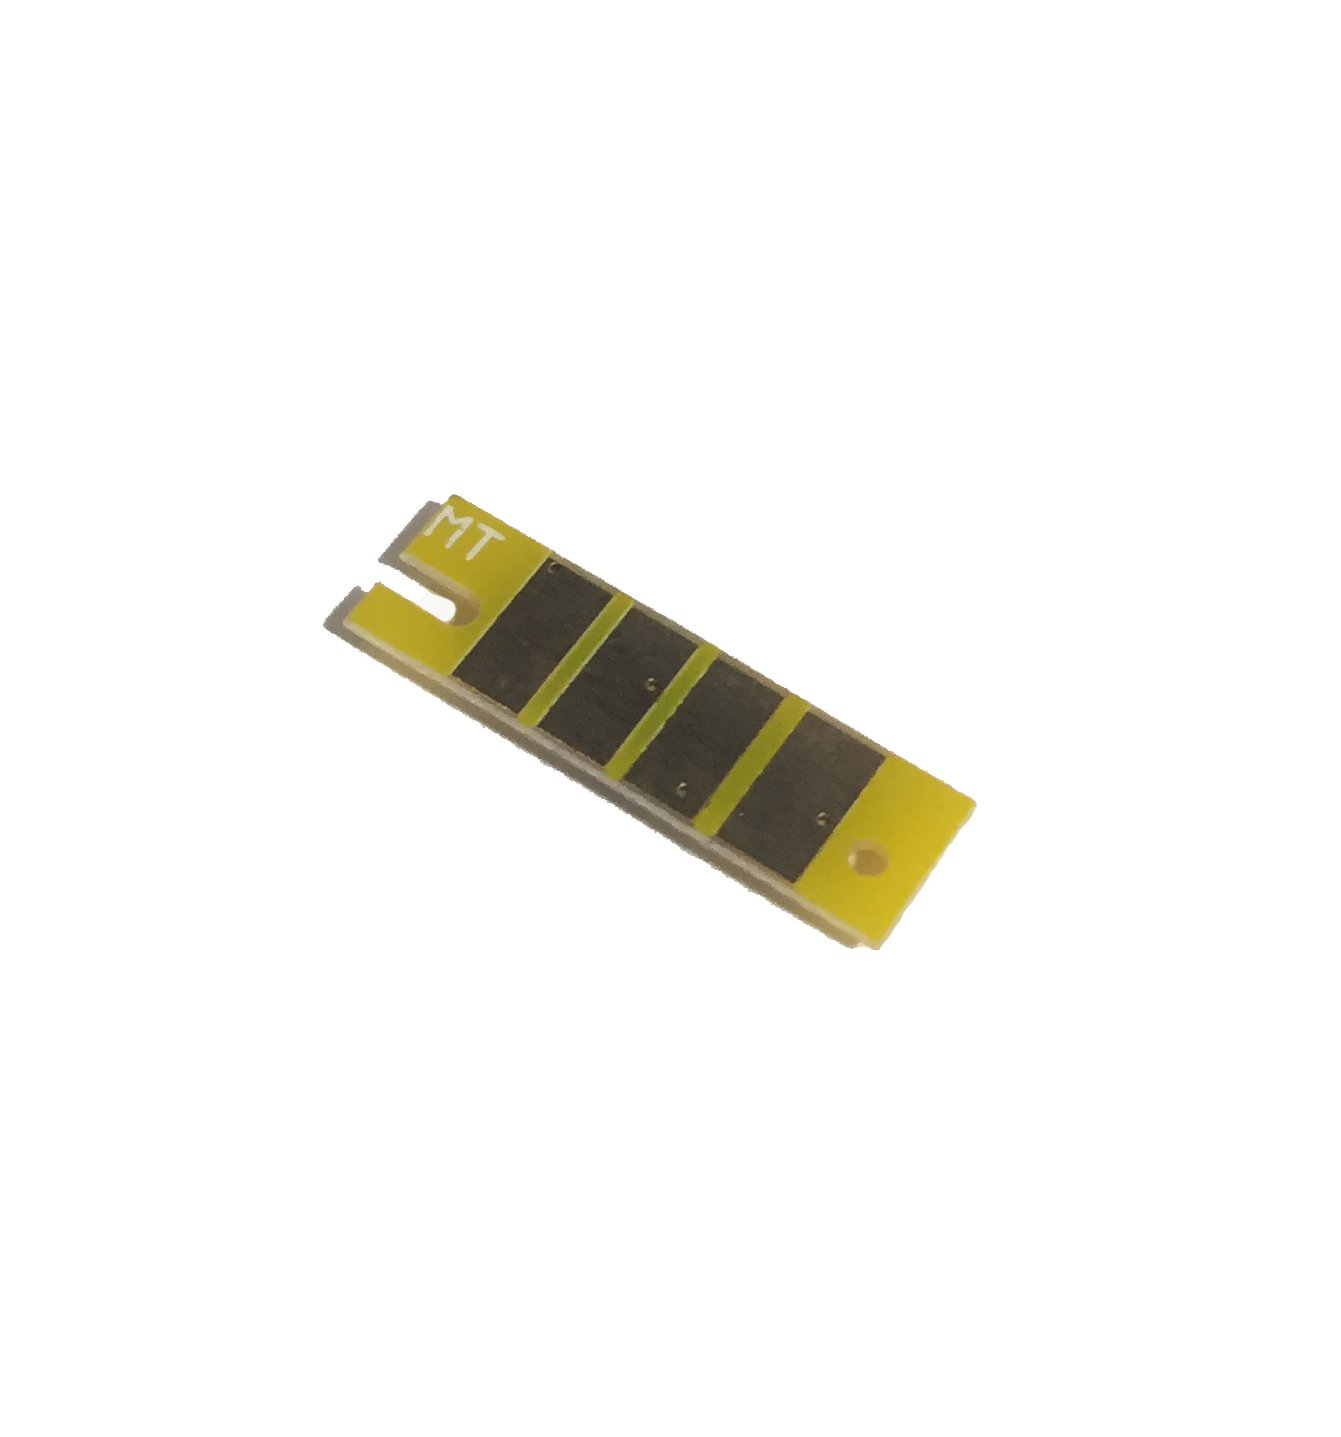 Chip para bañ era de recuperació n Ricoh Aficio SG 2100 N Stampa Continua / INTKEC